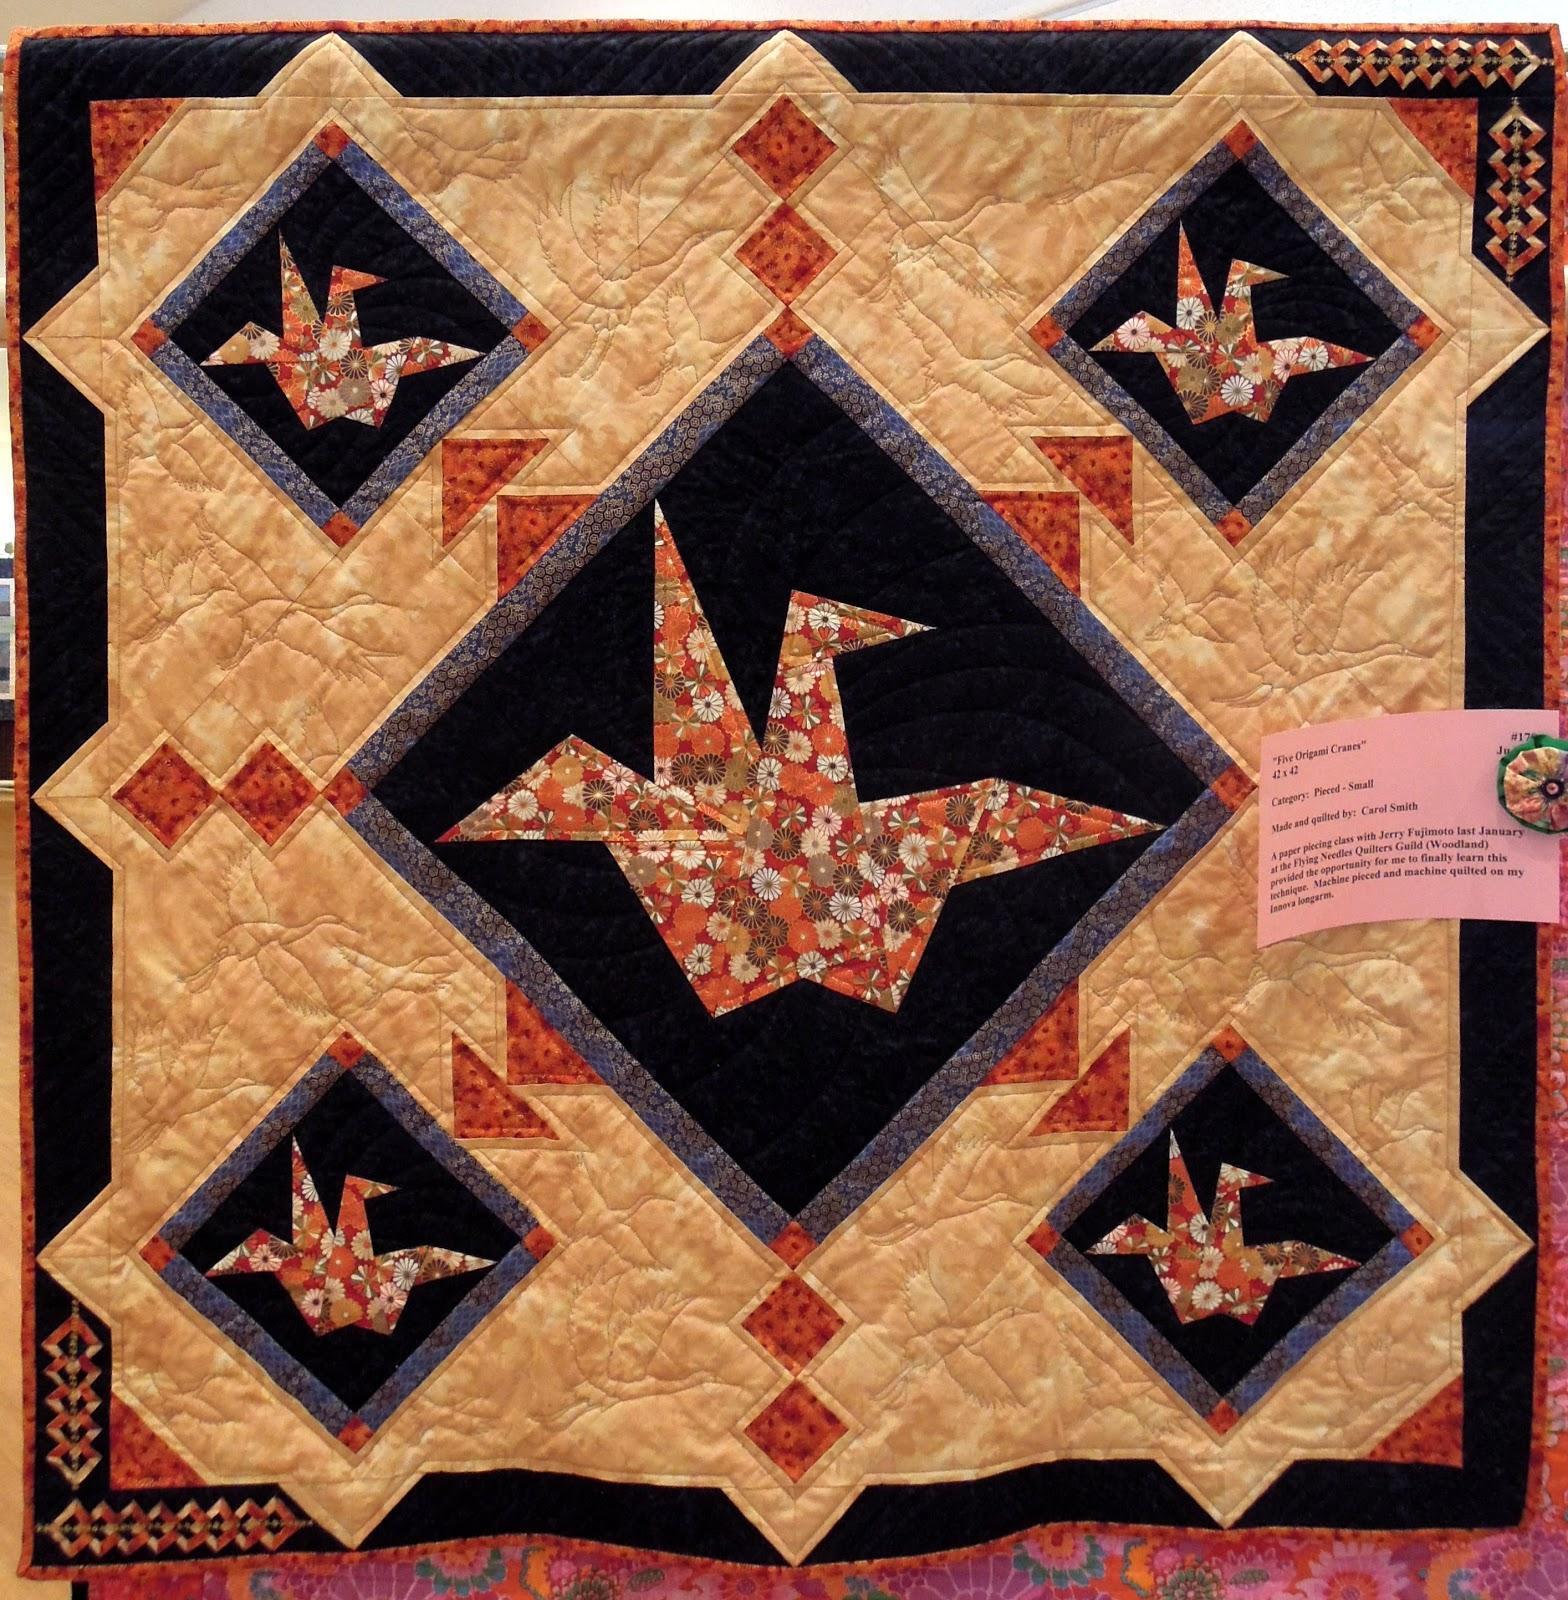 Quilt Inspiration Imagine World Peace Symbolism In Cloth